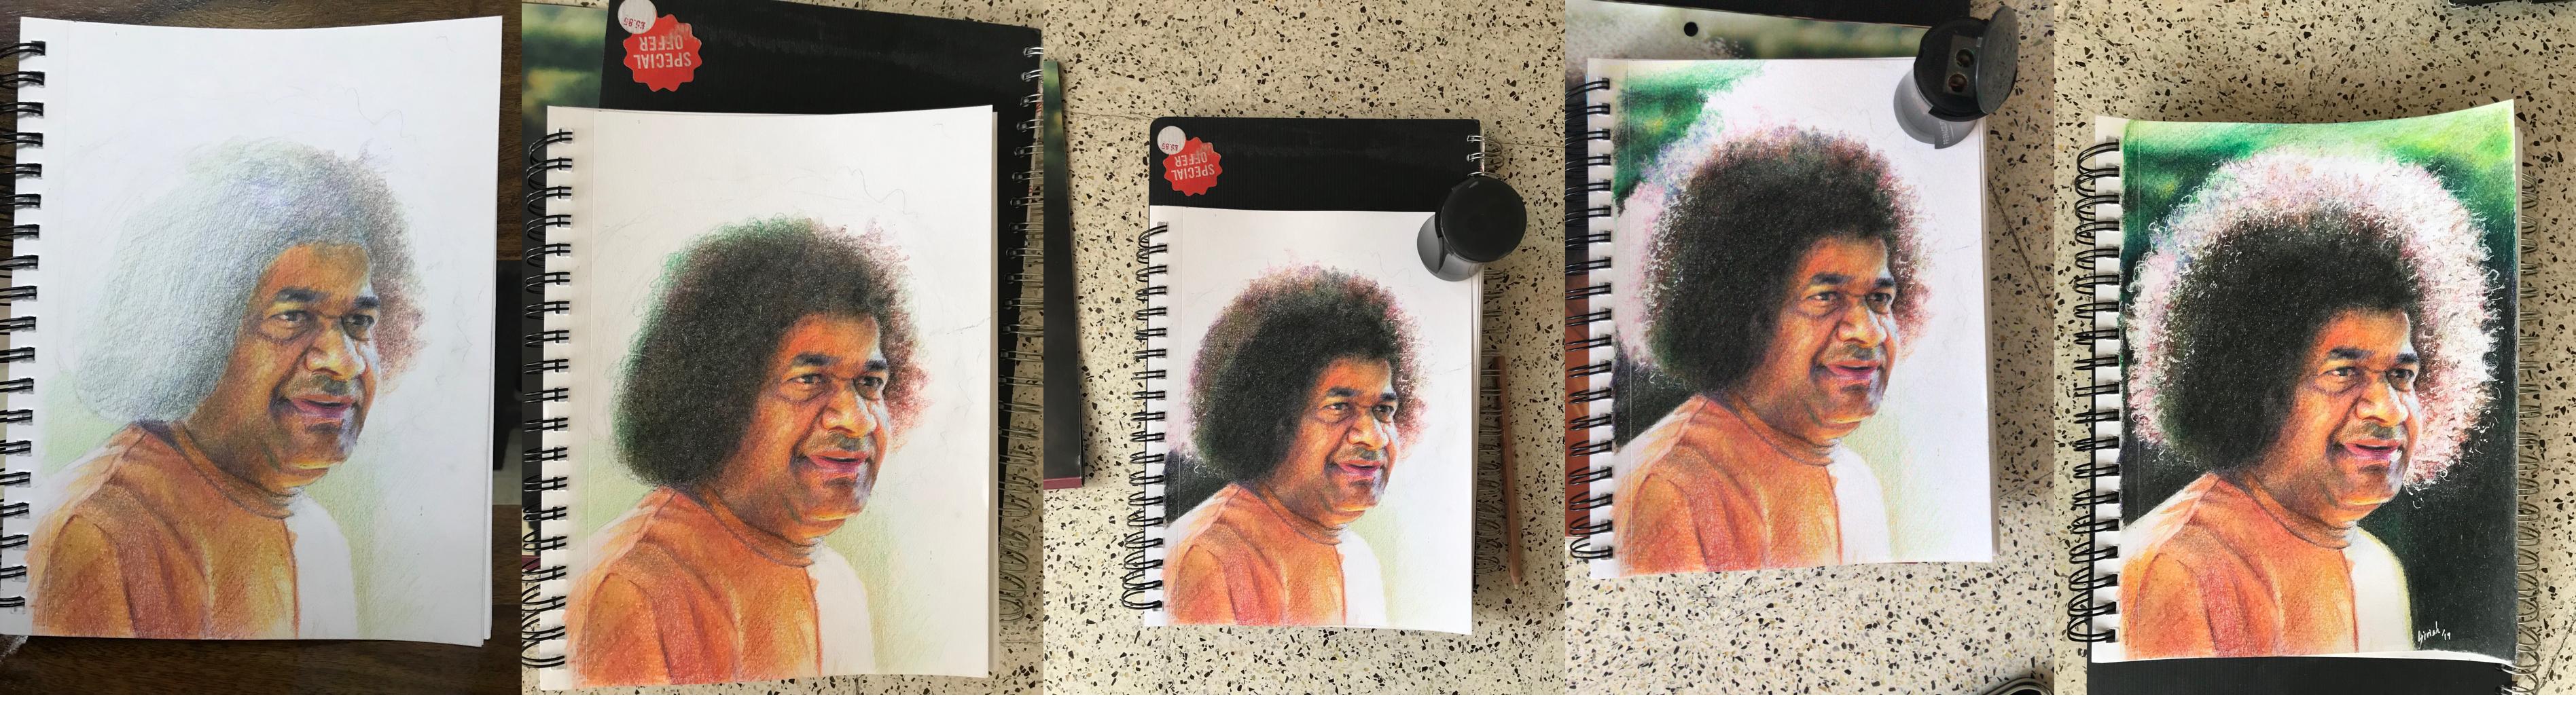 Some Progress images :)